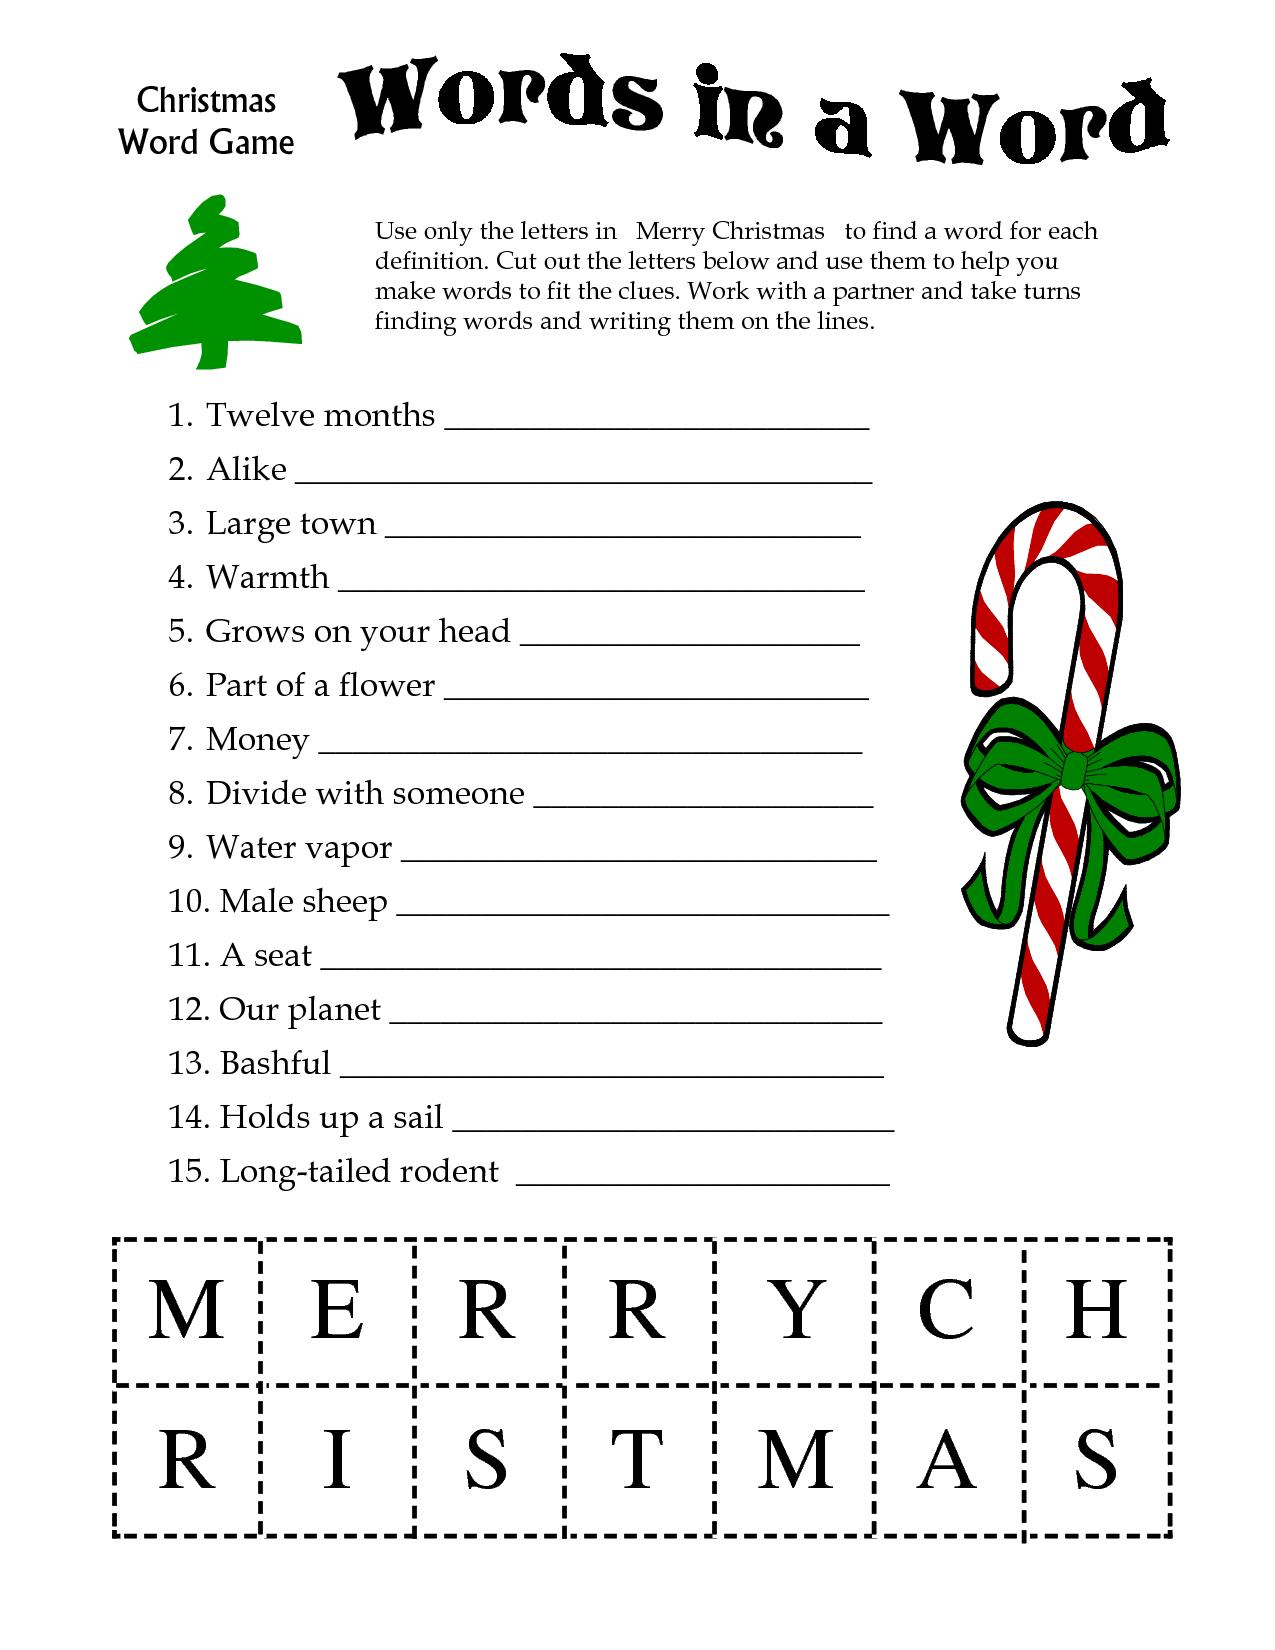 5 Images Of Free Printable Christmas Word Games | Printablee - Free Printable Christmas Games For Adults